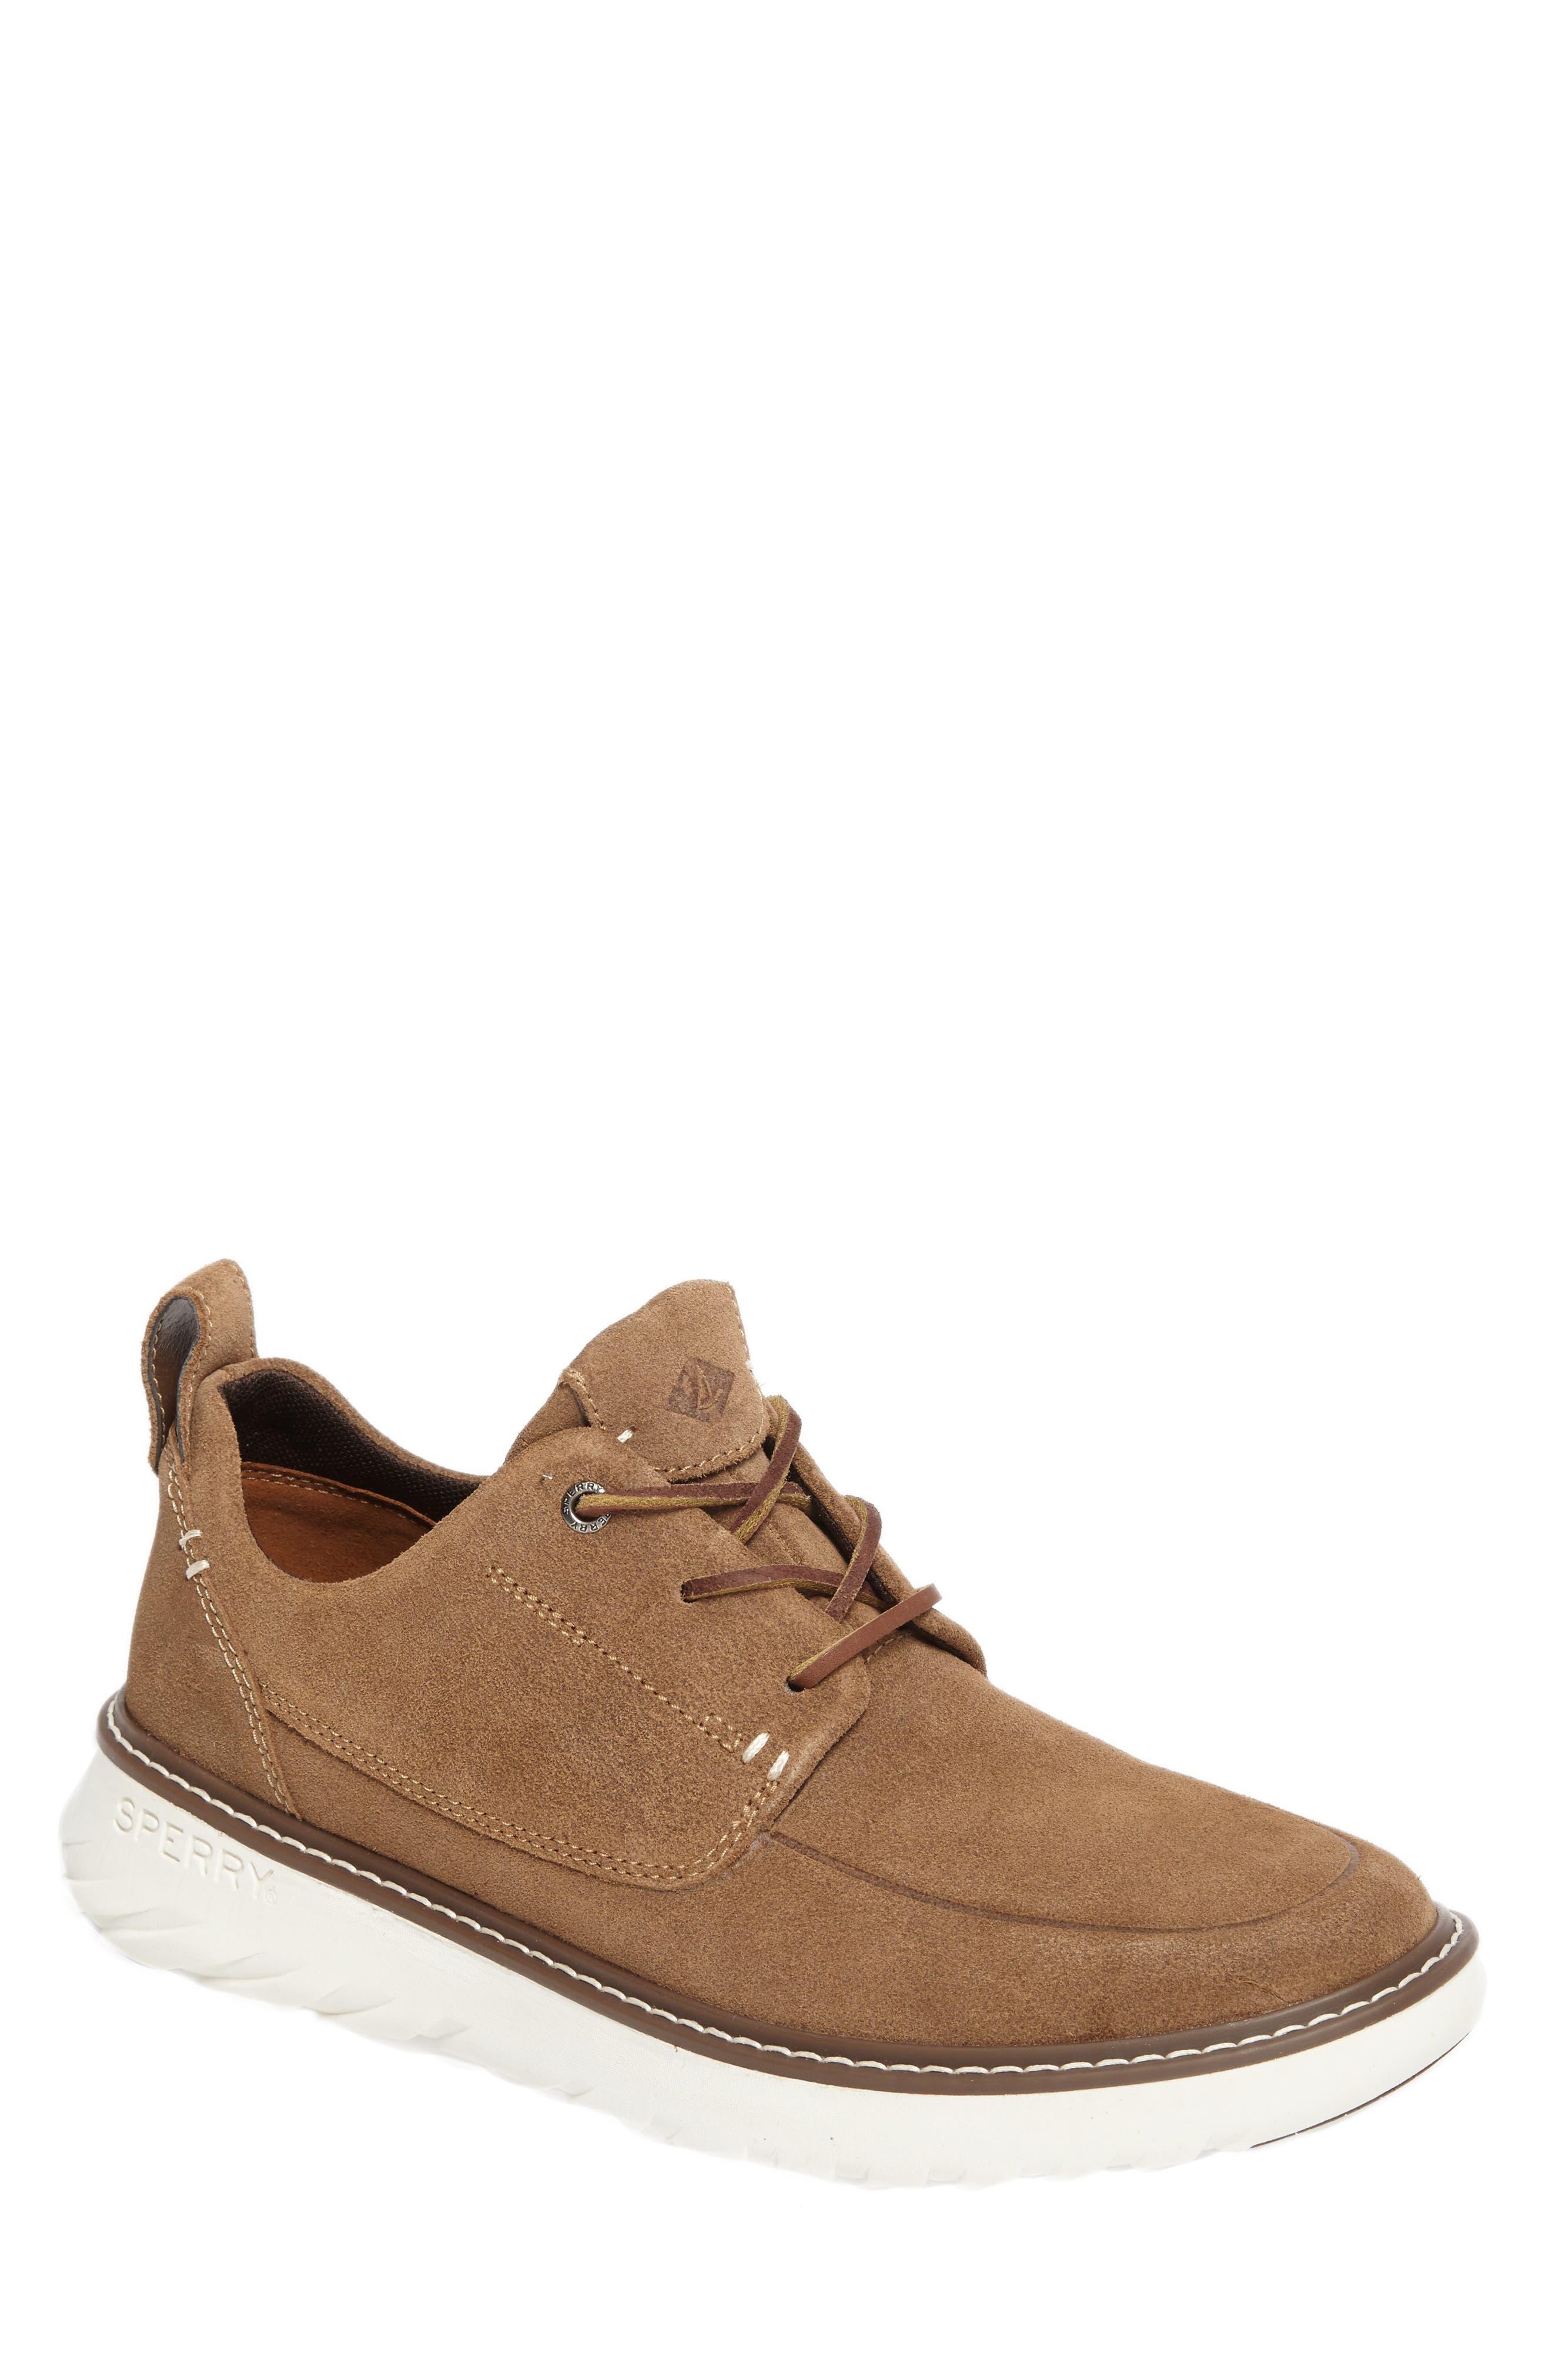 Element Chukka Boot,                             Main thumbnail 1, color,                             Carmel Leather